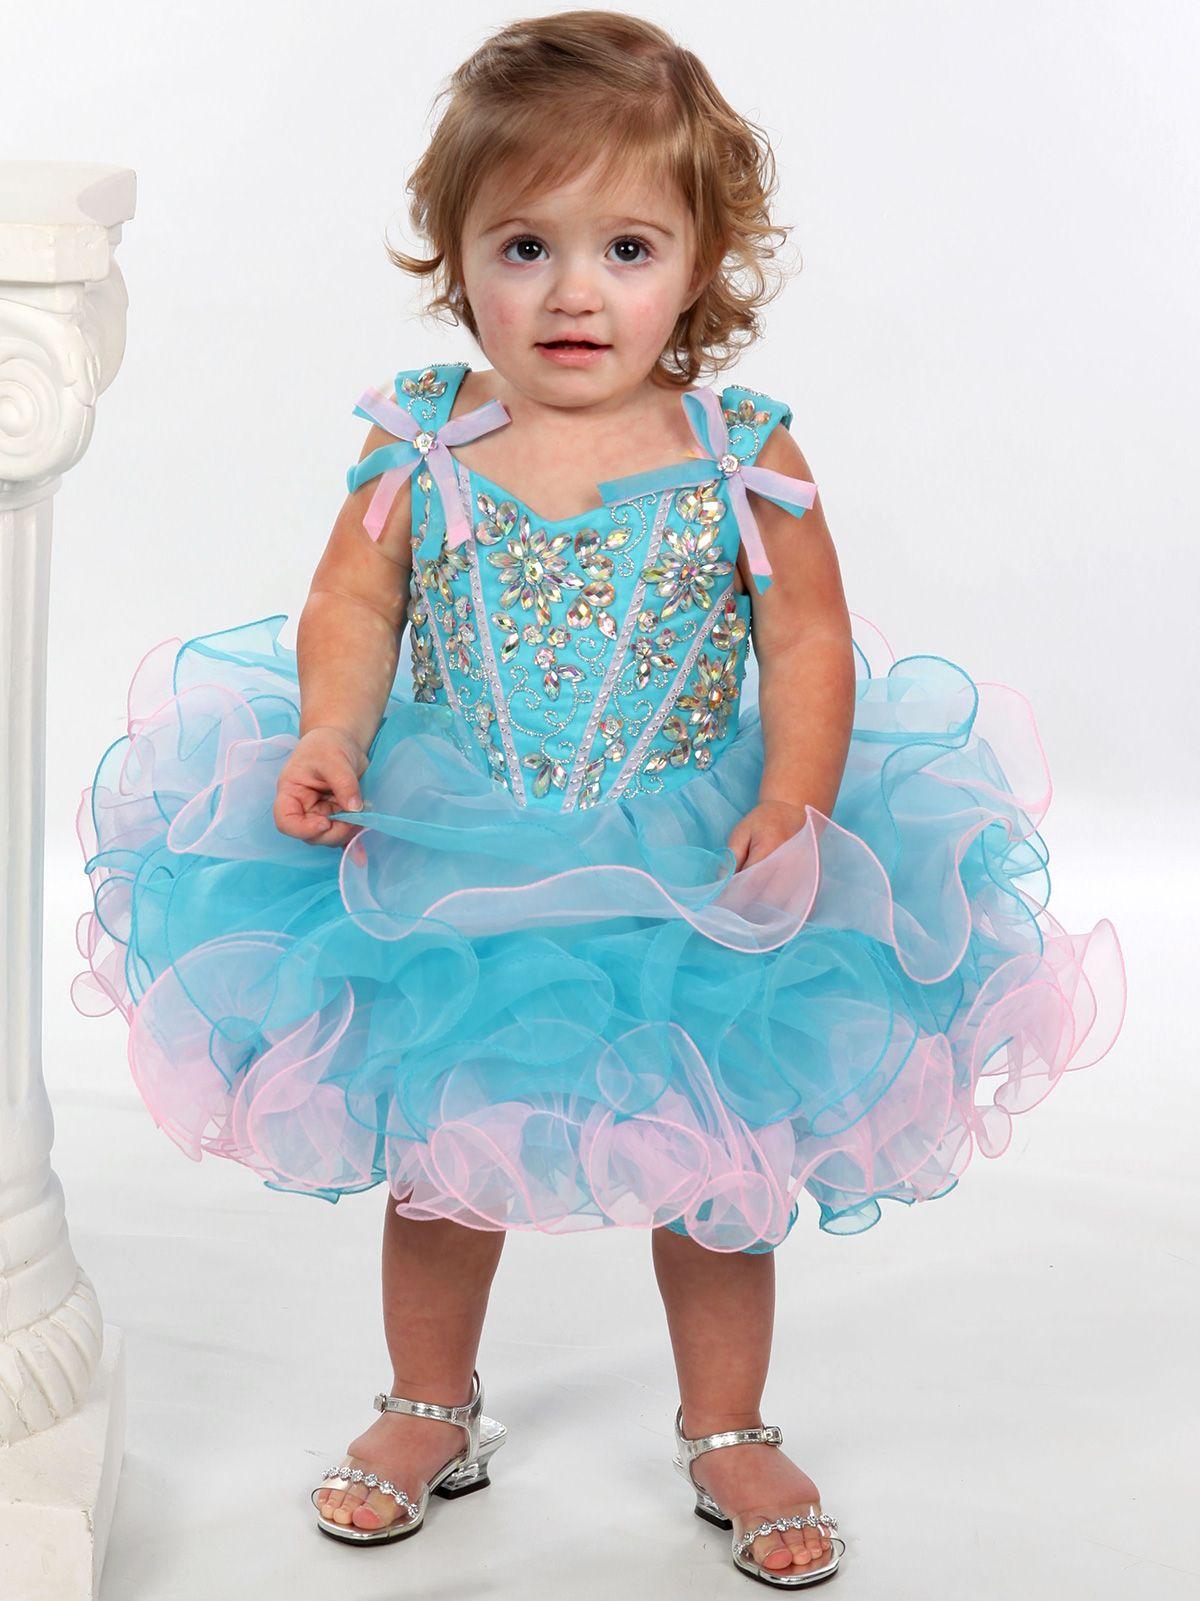 Blue dress age 7 year